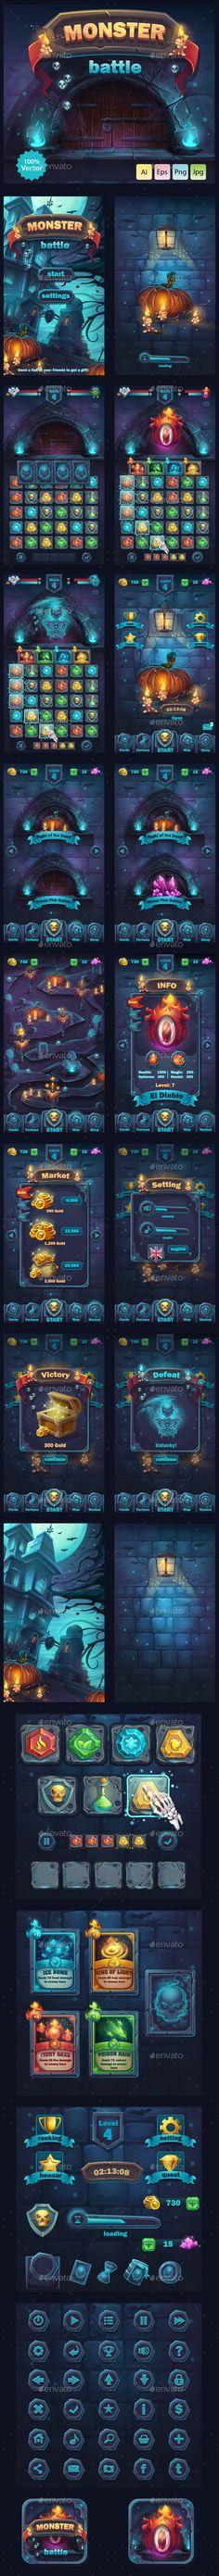 Monster Battle GUI Download link: https://graphicriver.net/item/monster-battle-gui/19841074?ref=klitz